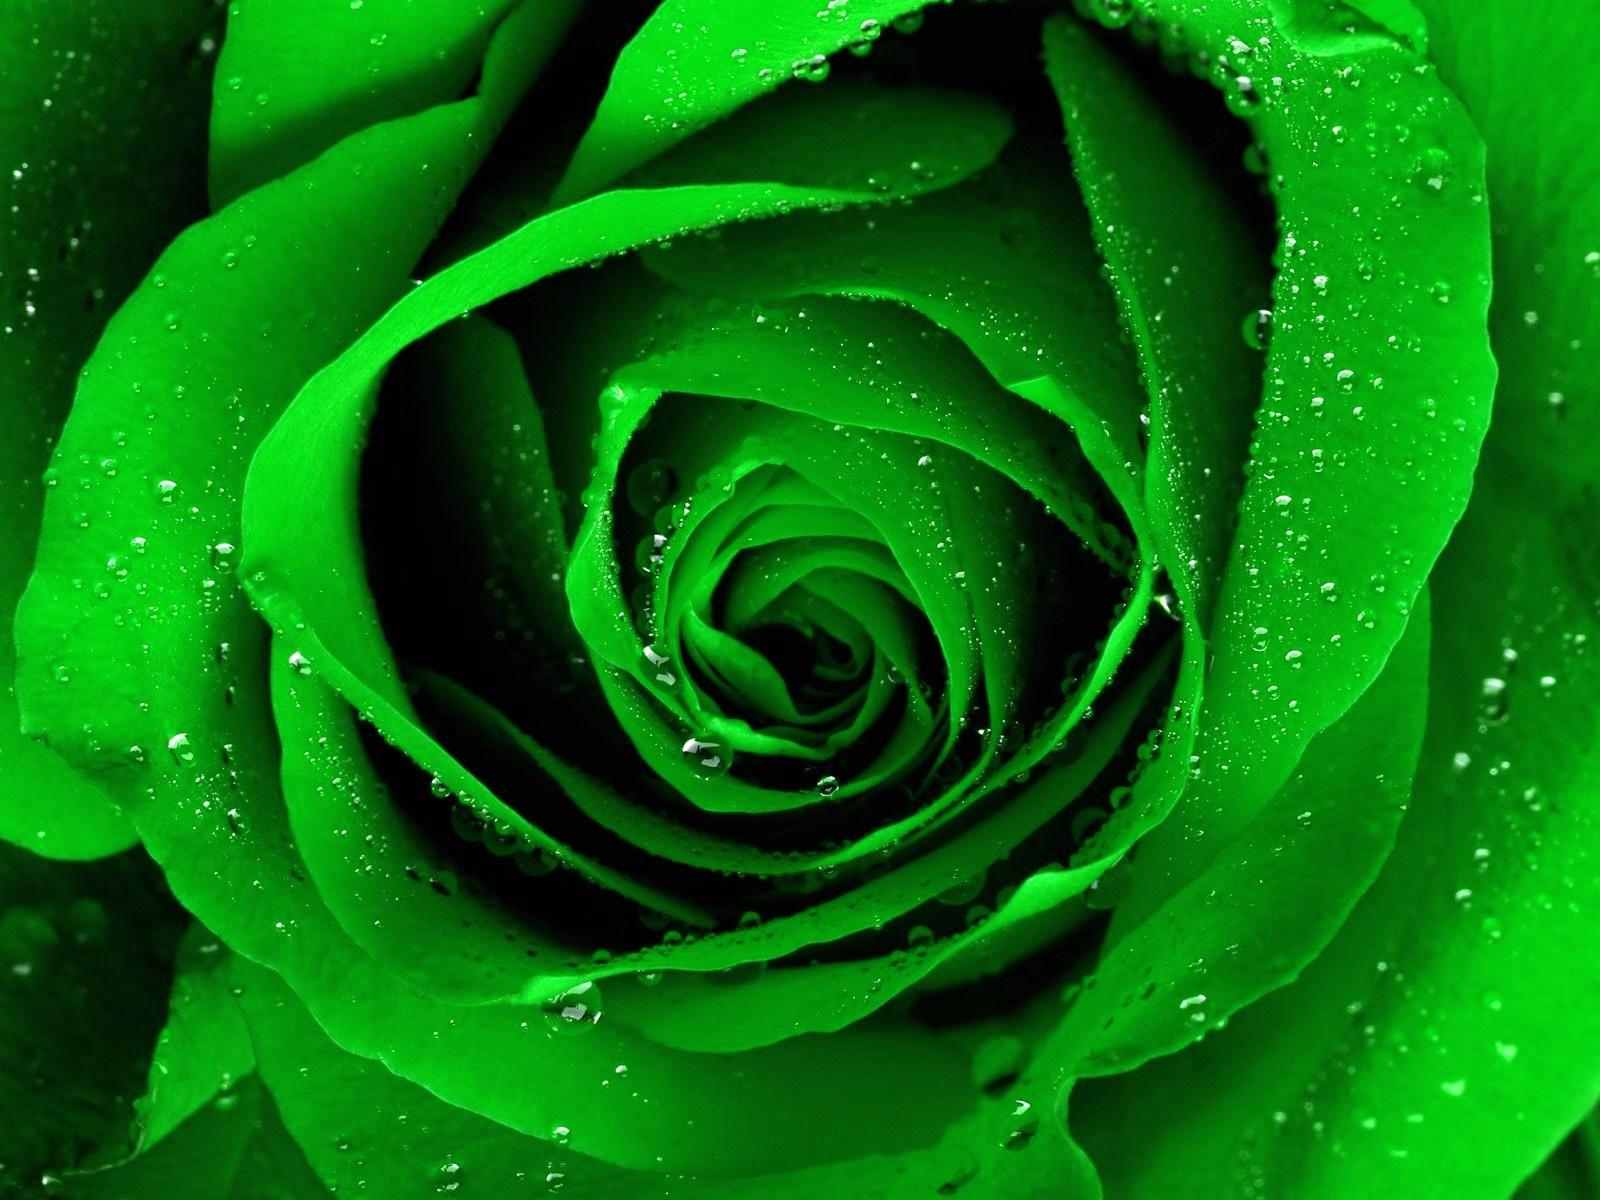 Green Roses Wallpaper